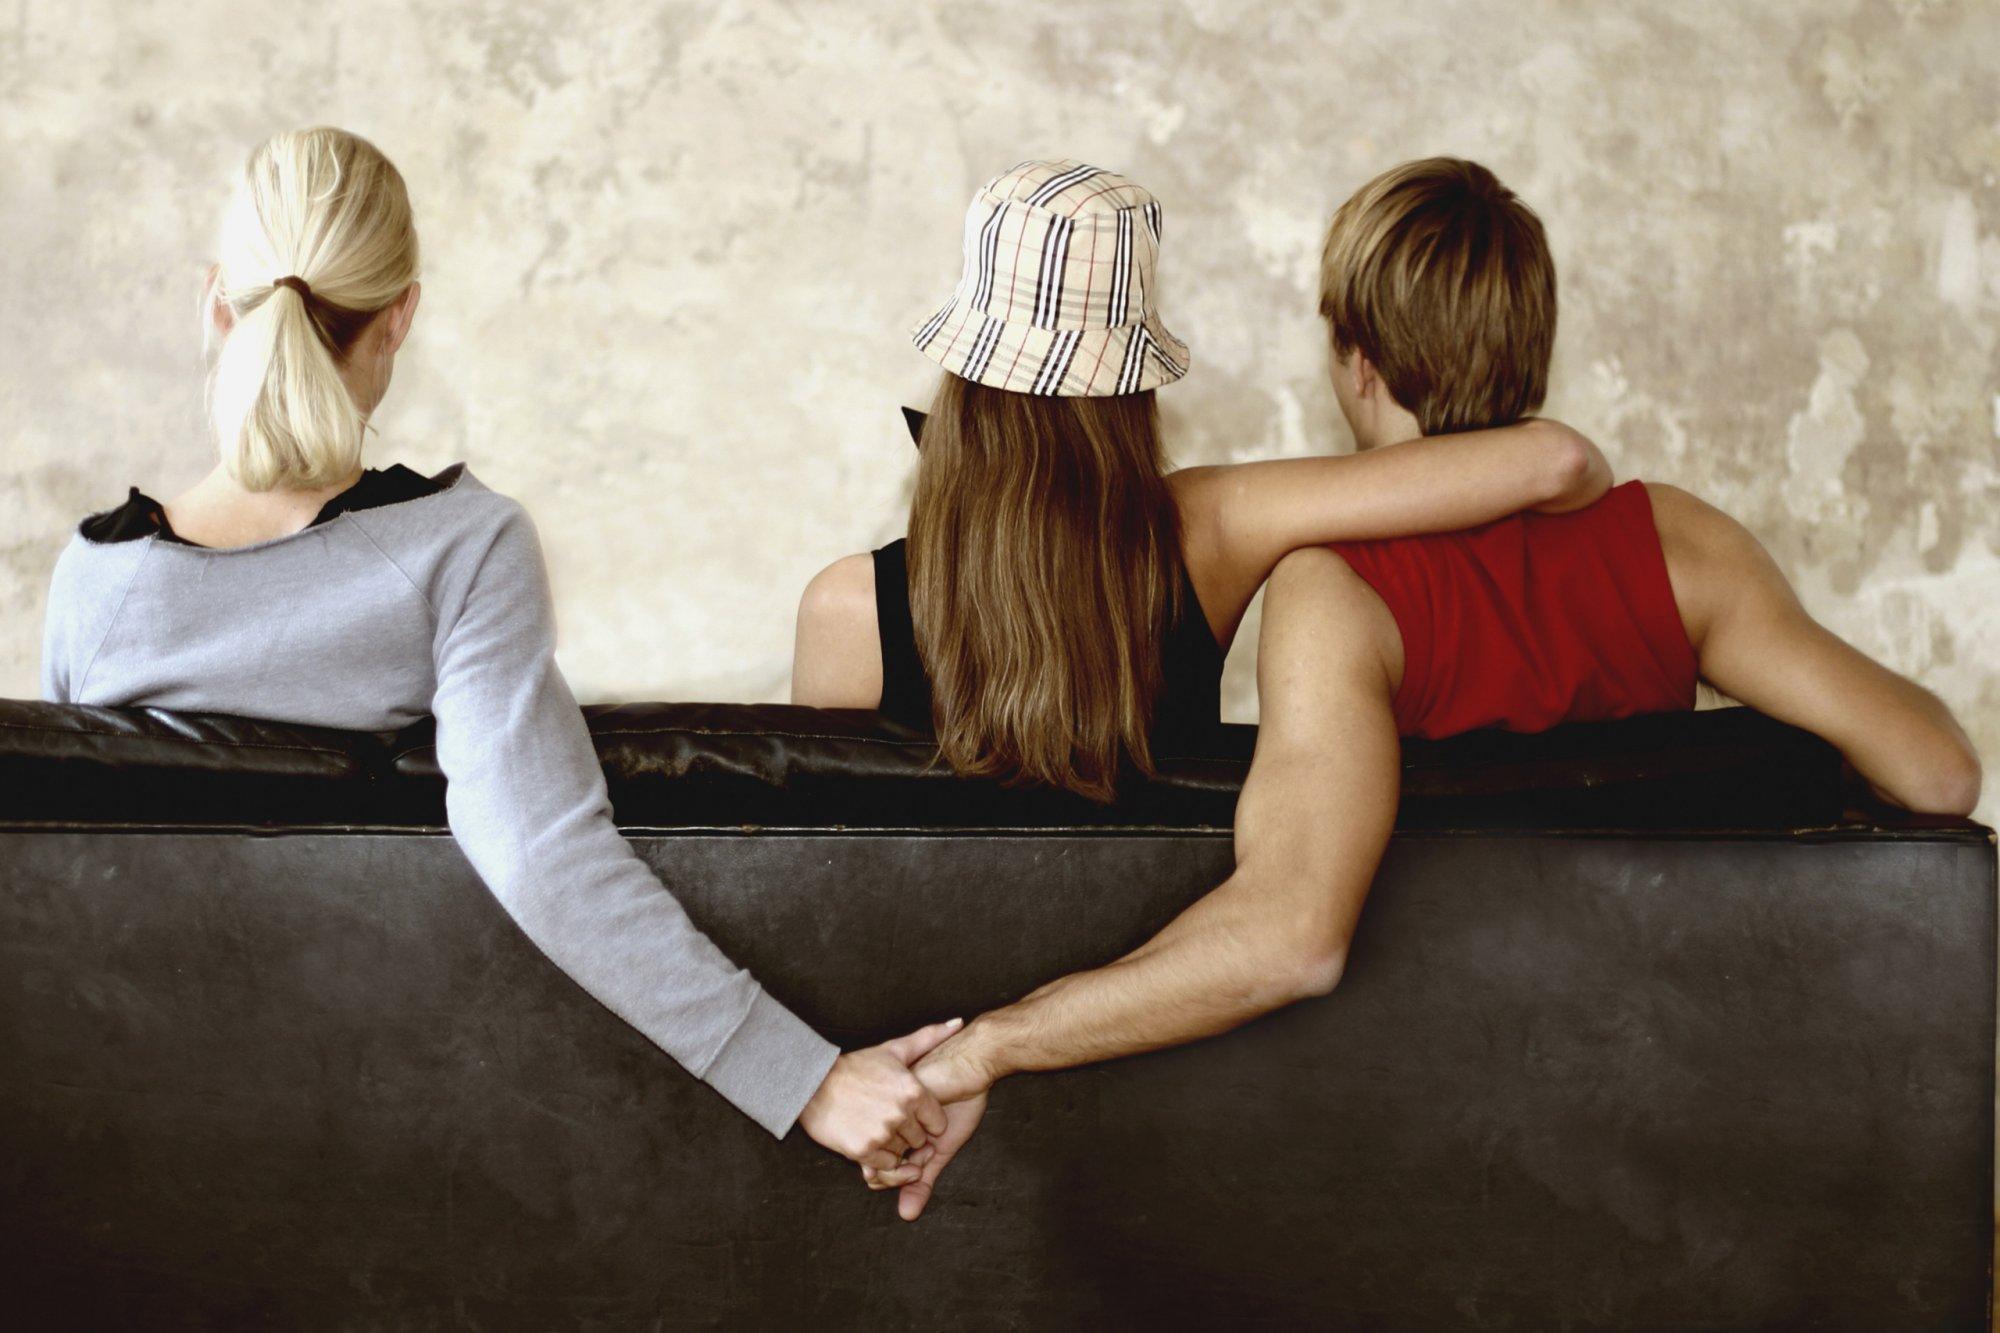 Reasons of divorce in India